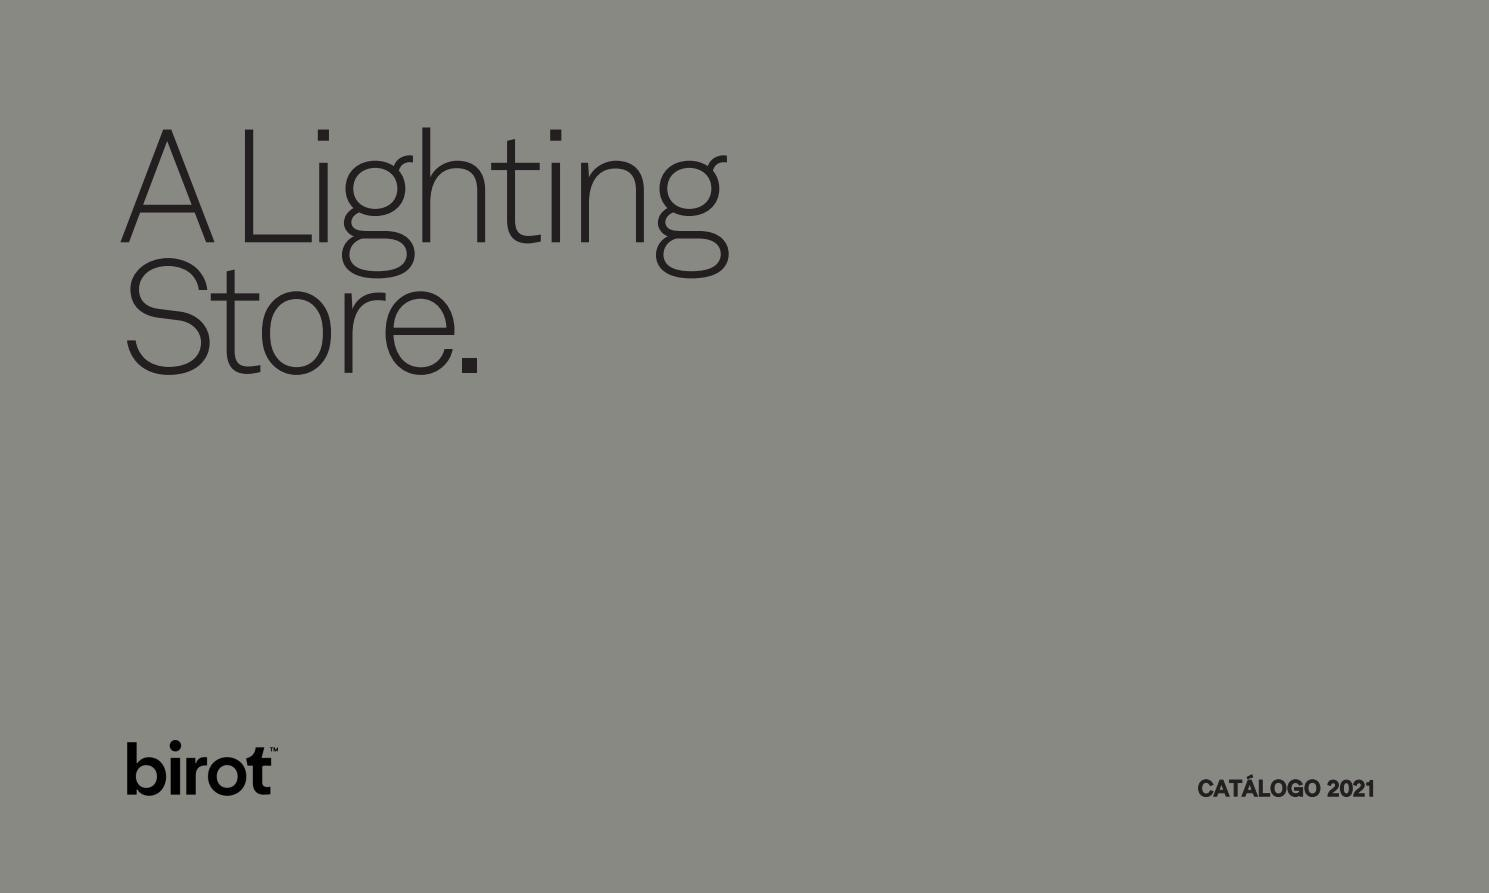 birot lighting